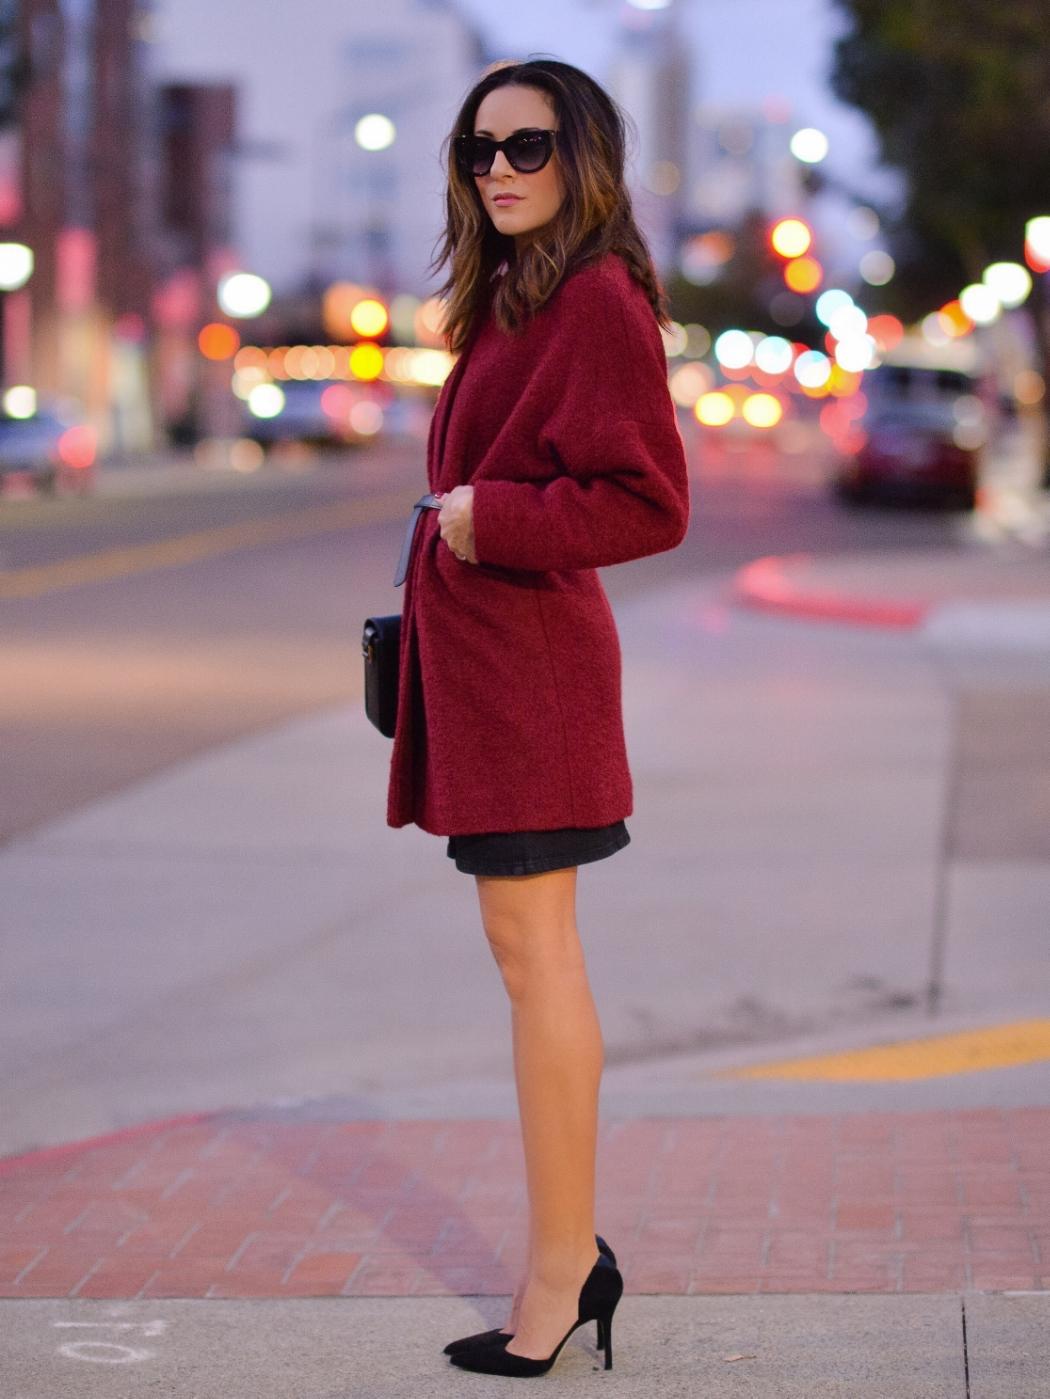 Topshop_Coat_Fashion_SaintLaurent_SanDiego_Streetstyle_LucysWhims.jpg